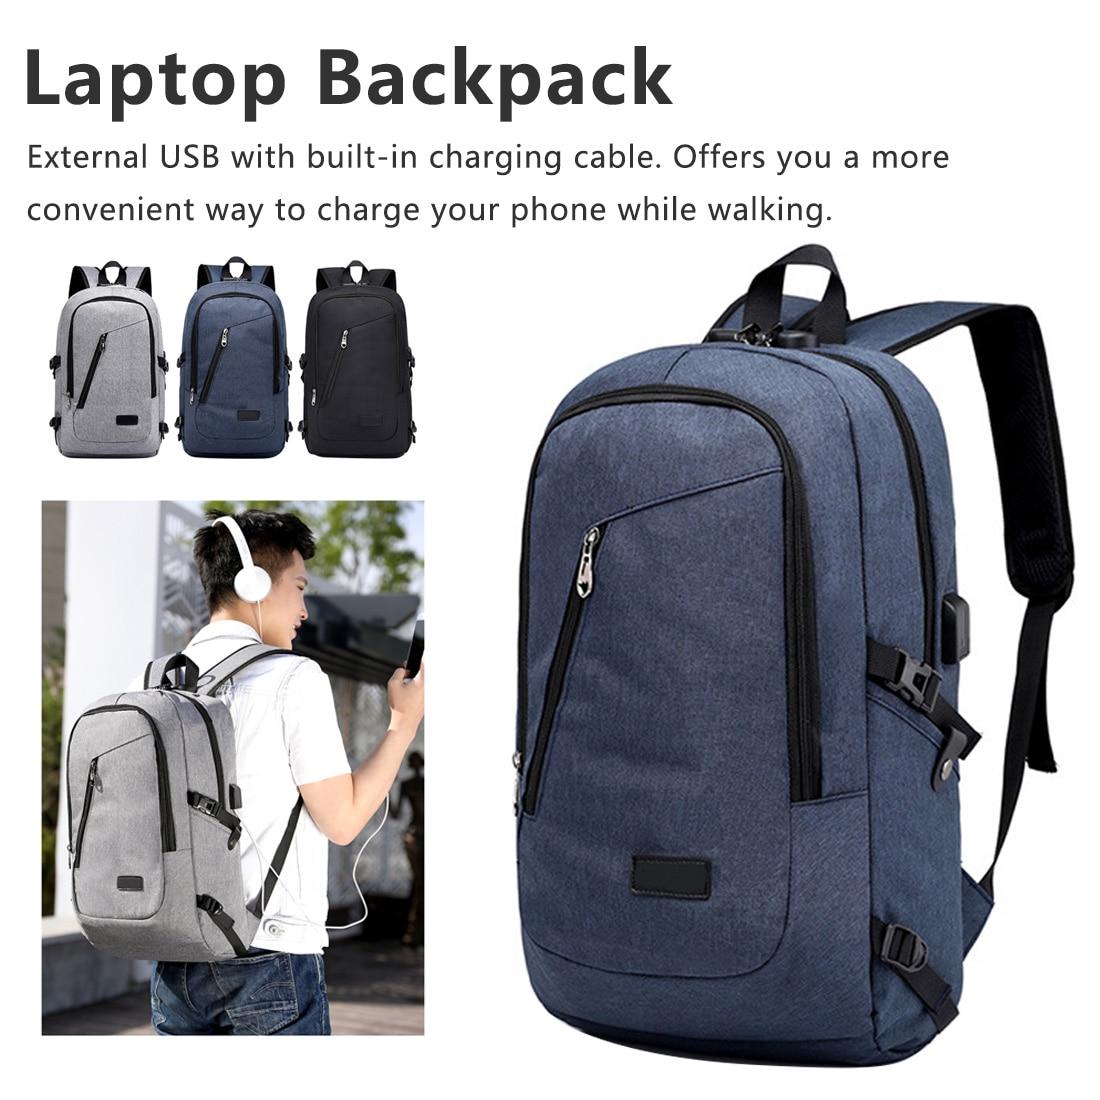 Laptop Backpack USB Charging Male Anti Travel Bag Fashion Sports Schoolbag Theft Password Locks School Bag Casual Bag Waterproof